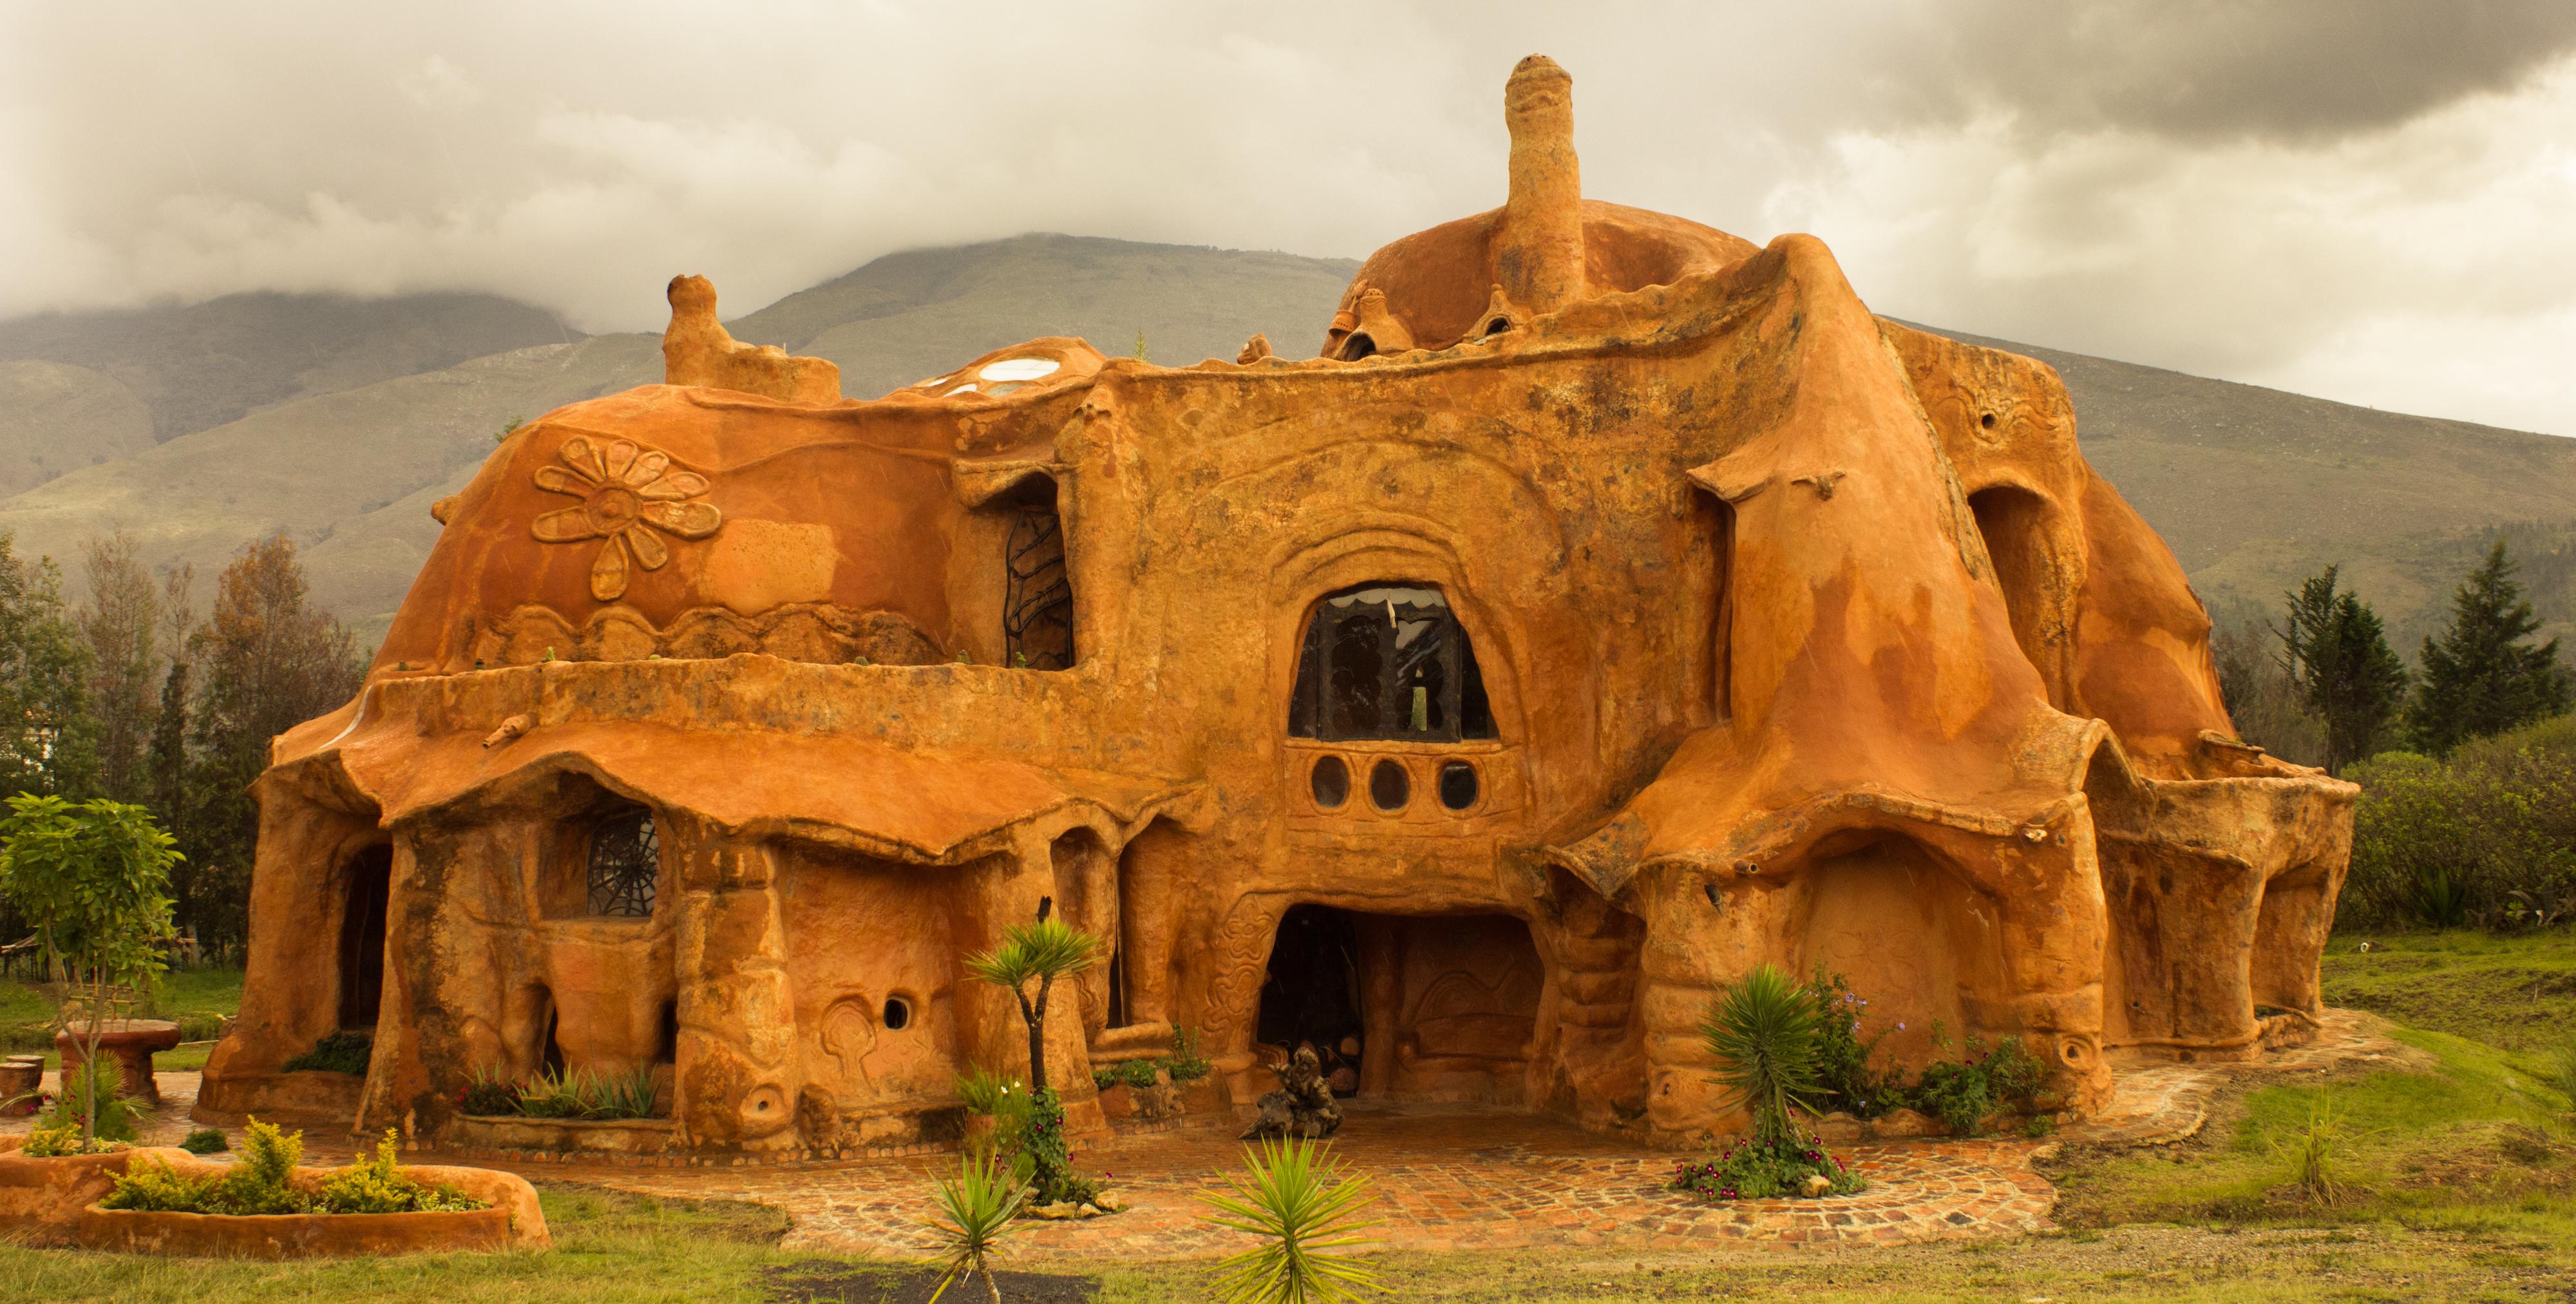 Casa de barro Villa de Leyva